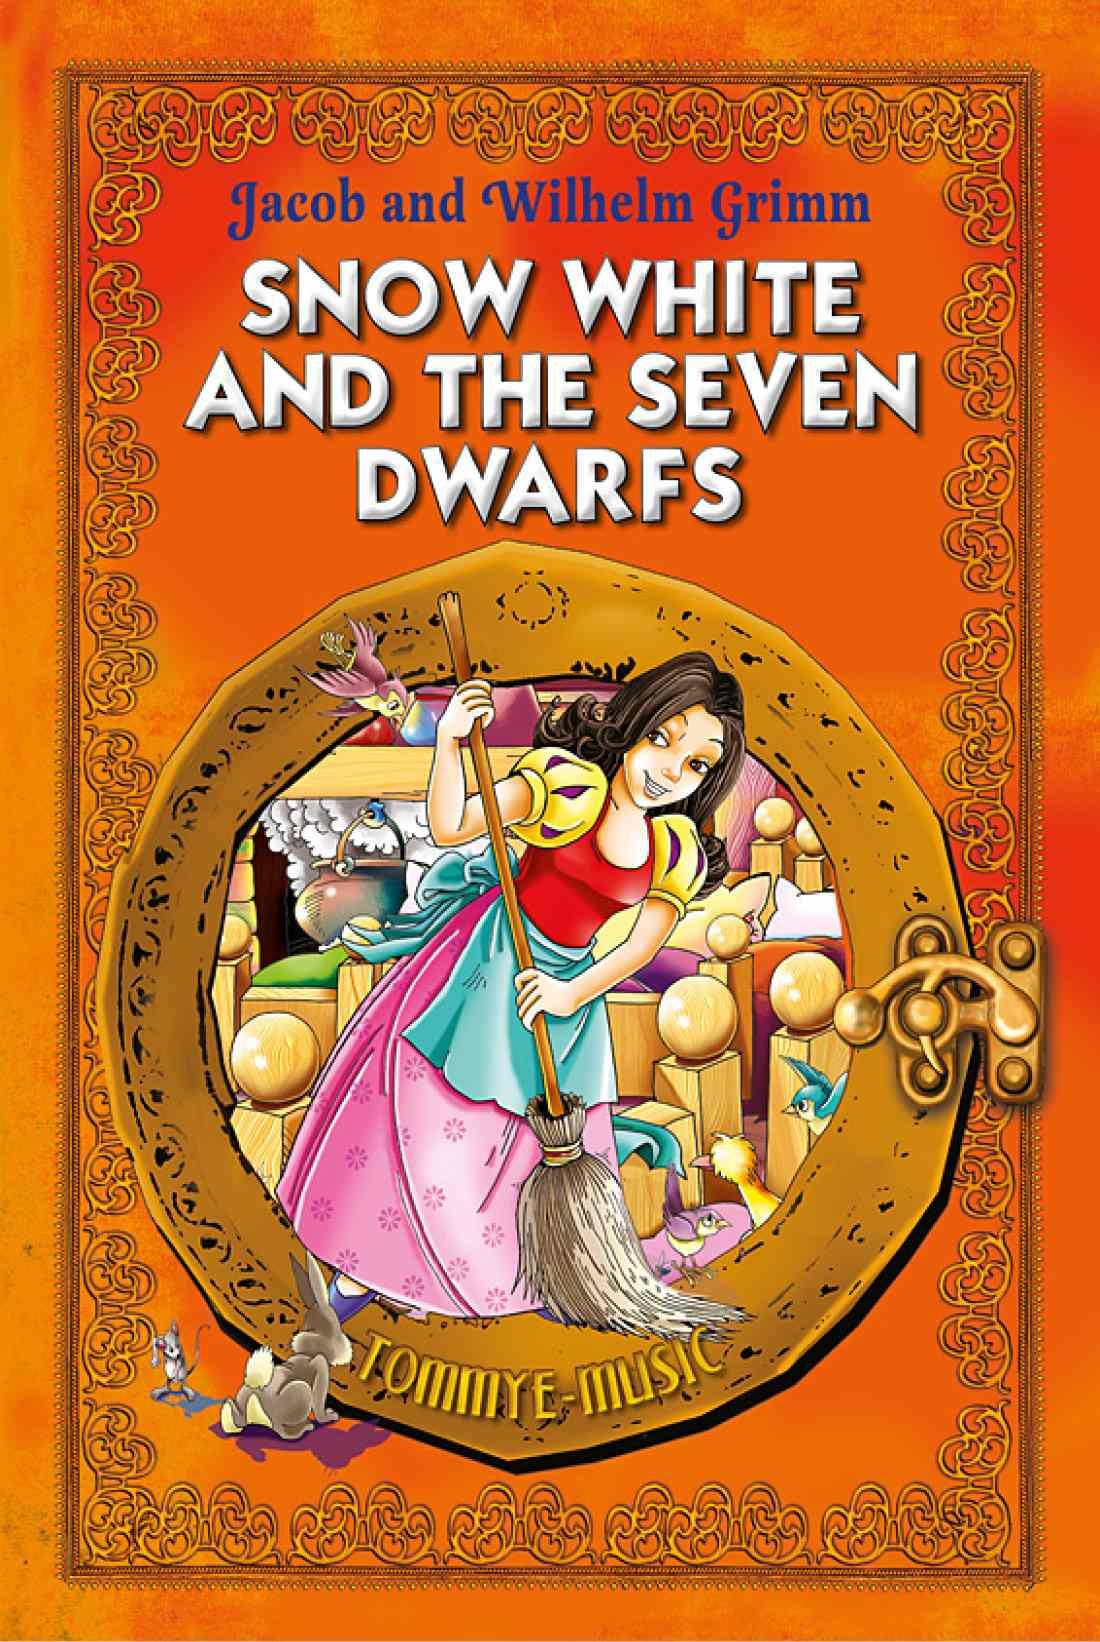 Snow White and the Seven Dwarfs (Królewna Śnieżka) English version - Ebook (Książka EPUB) do pobrania w formacie EPUB